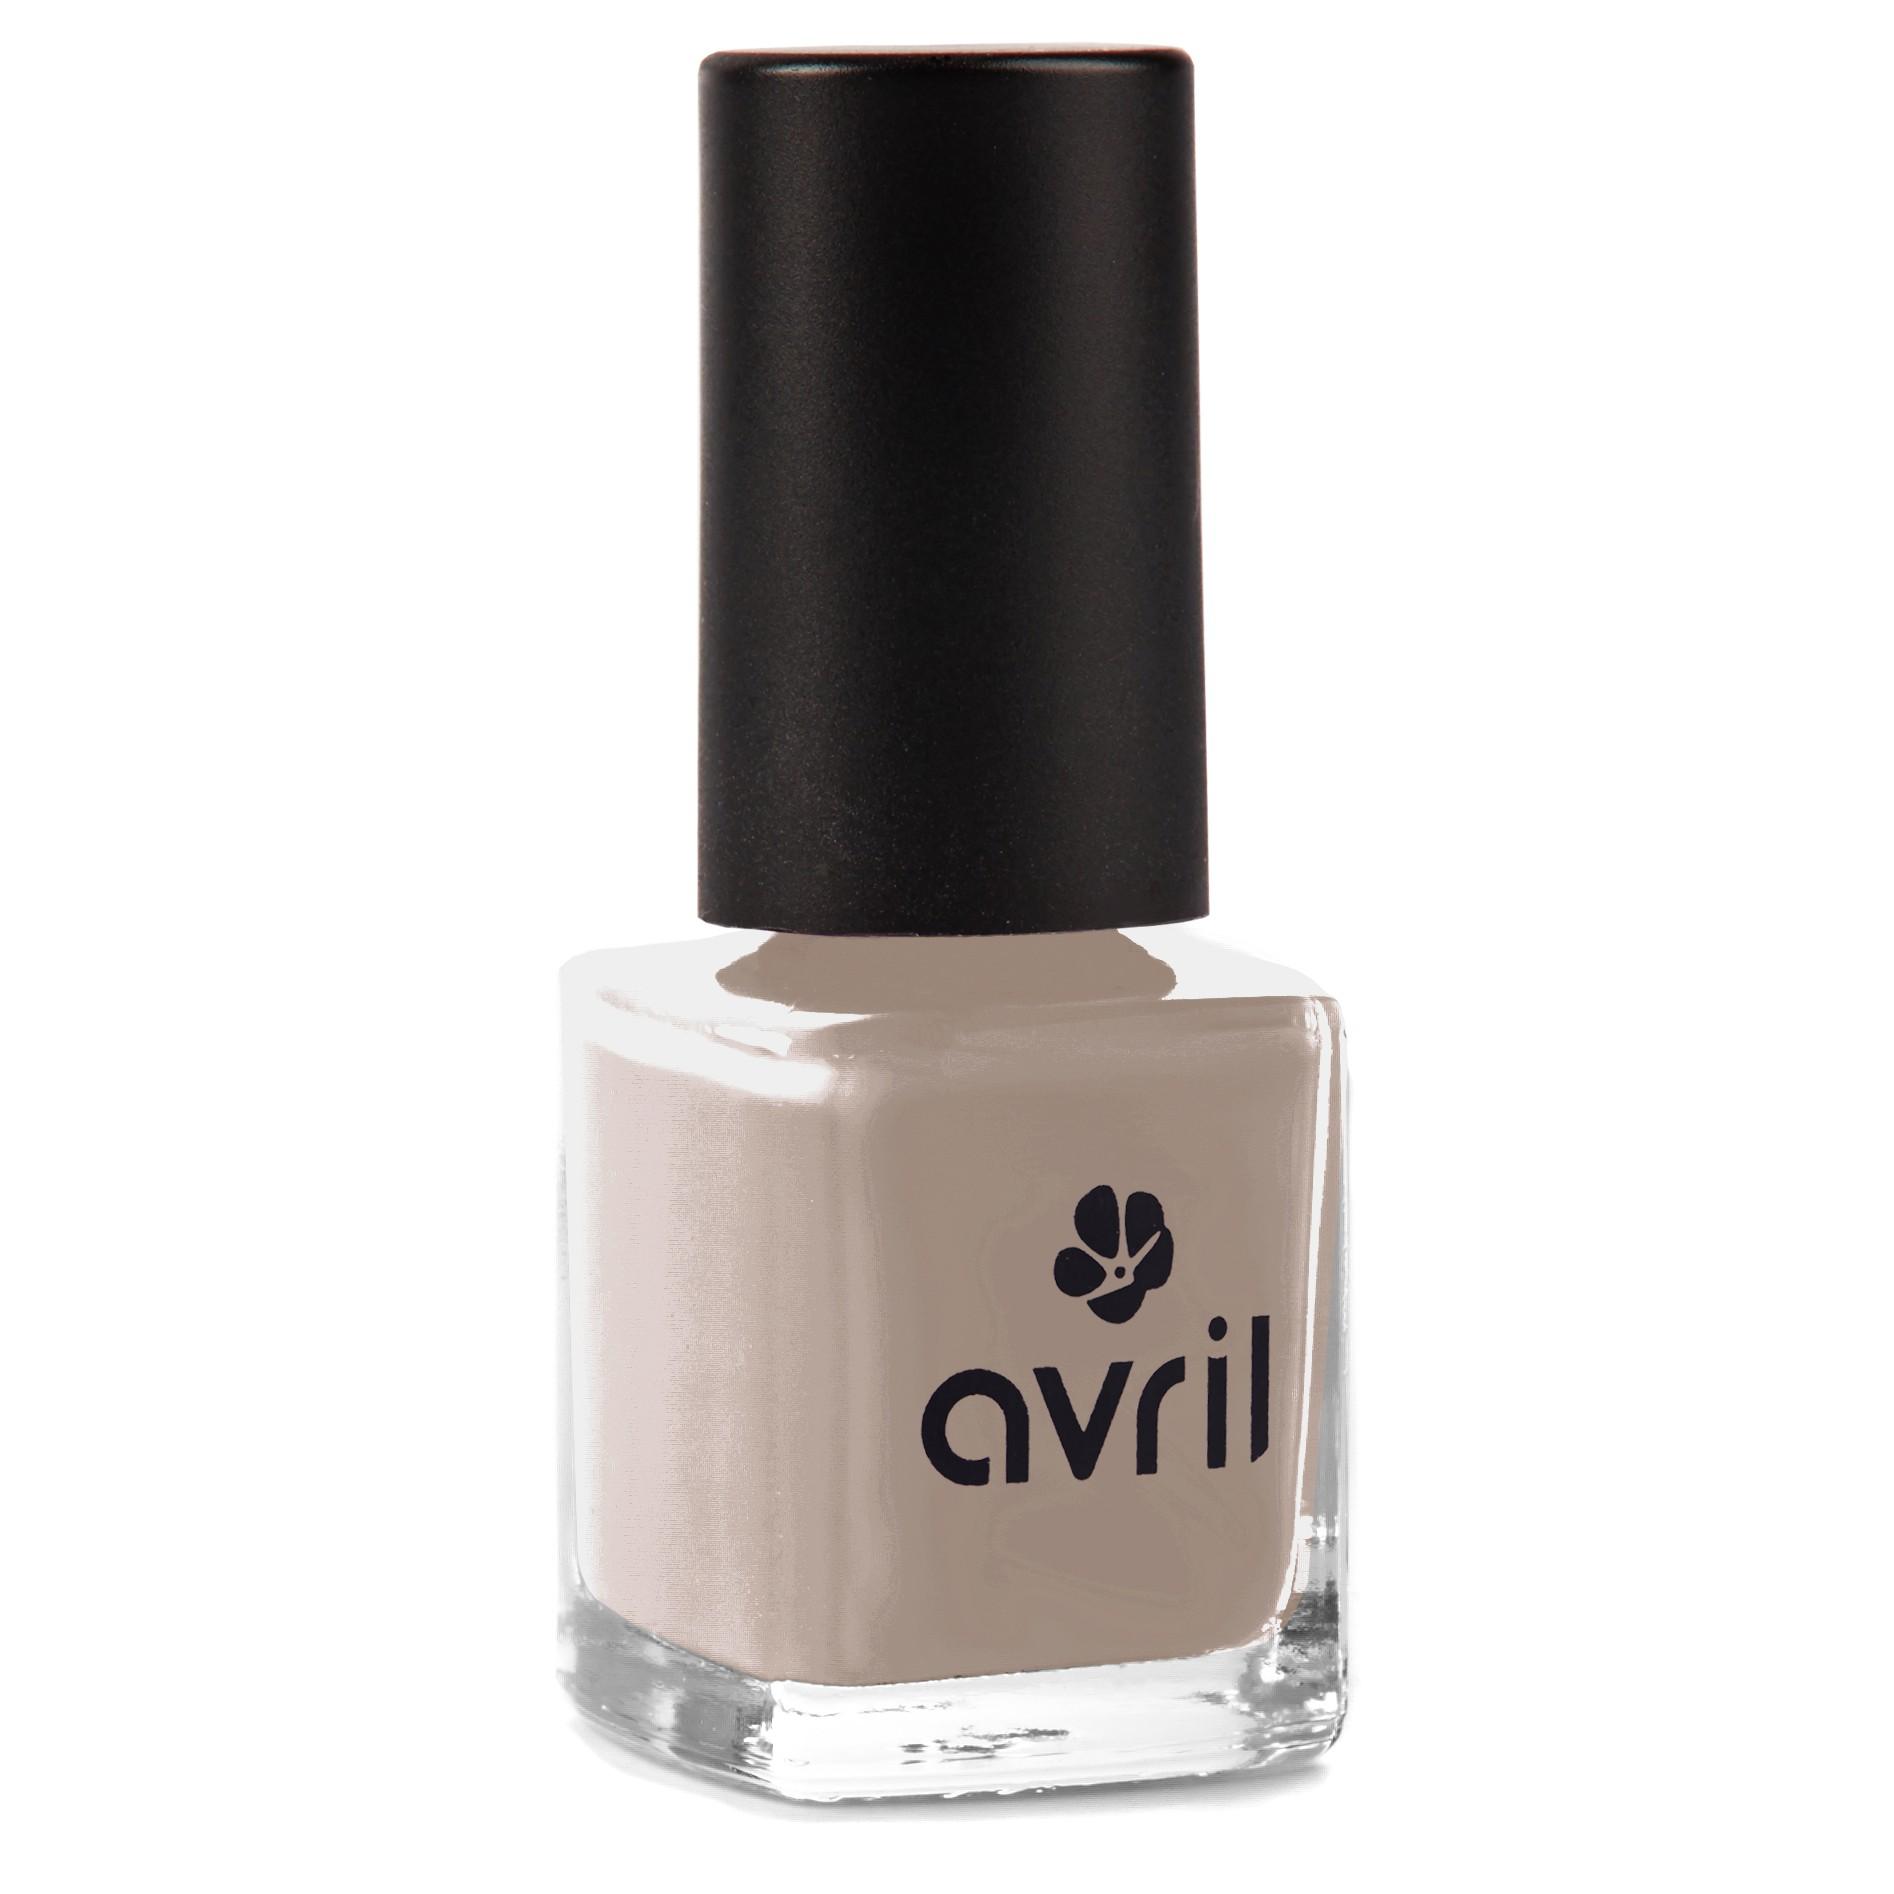 Taupe nail polish, 81% of natural ingredients